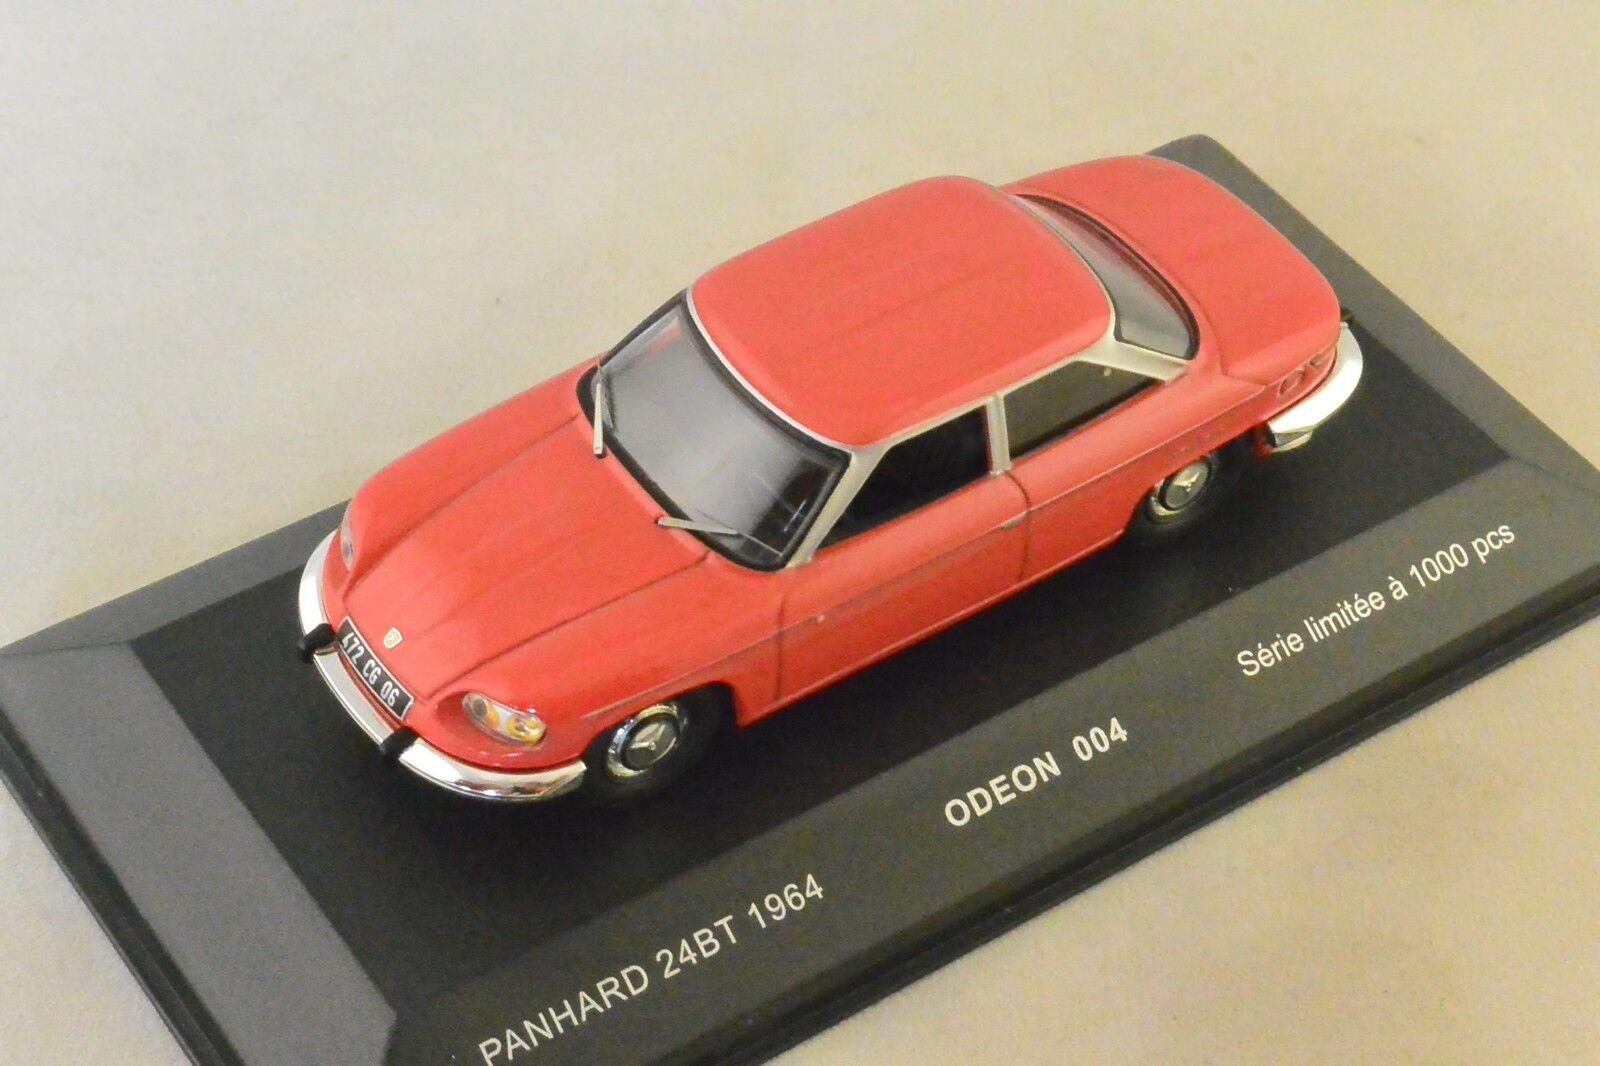 ODEON 004 - PANHARD 24 BT 1964 ROUGE  1 43